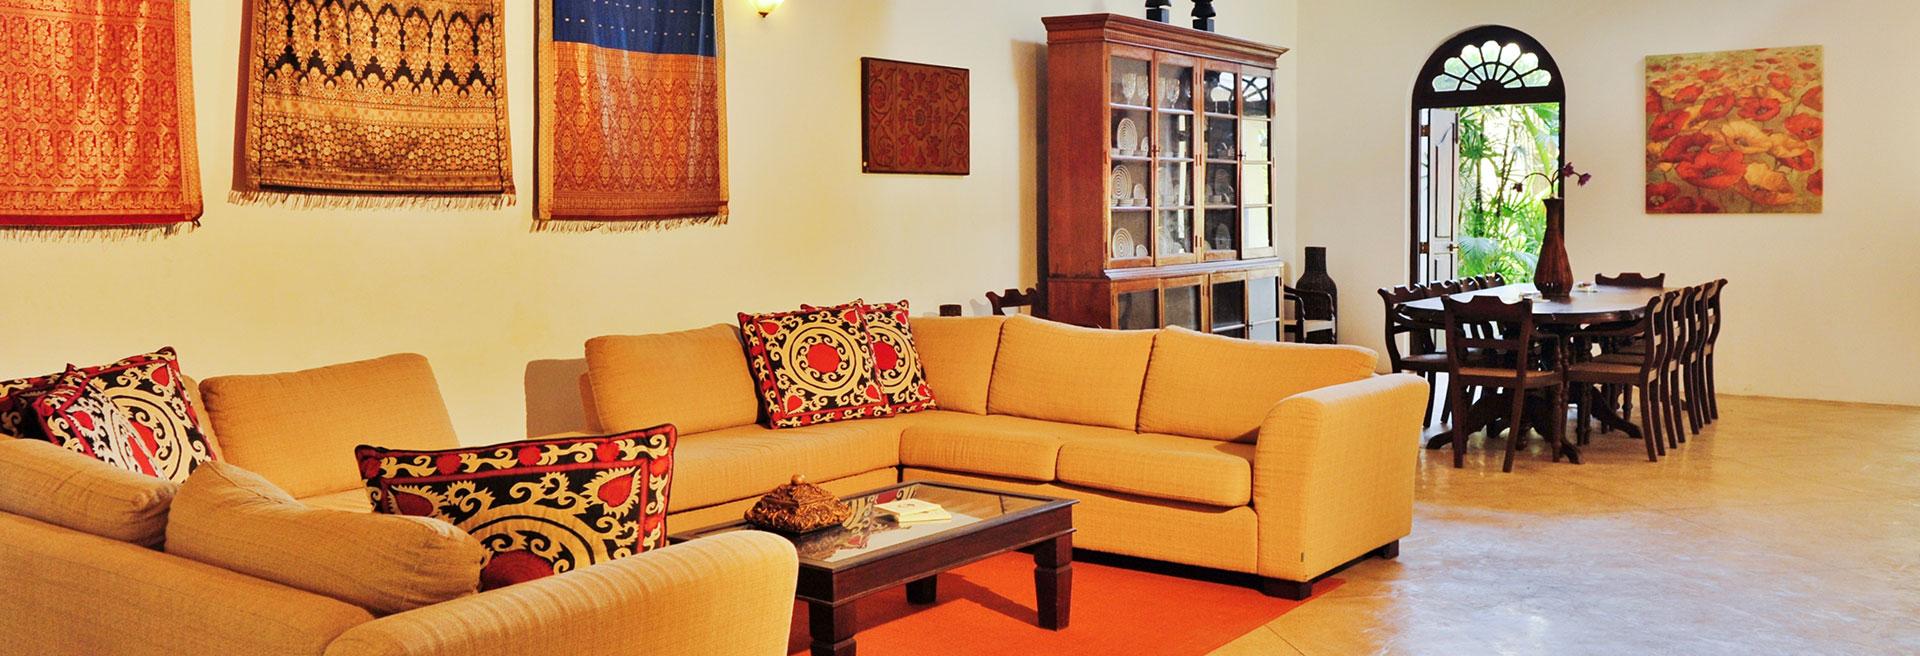 large indoor sitting area